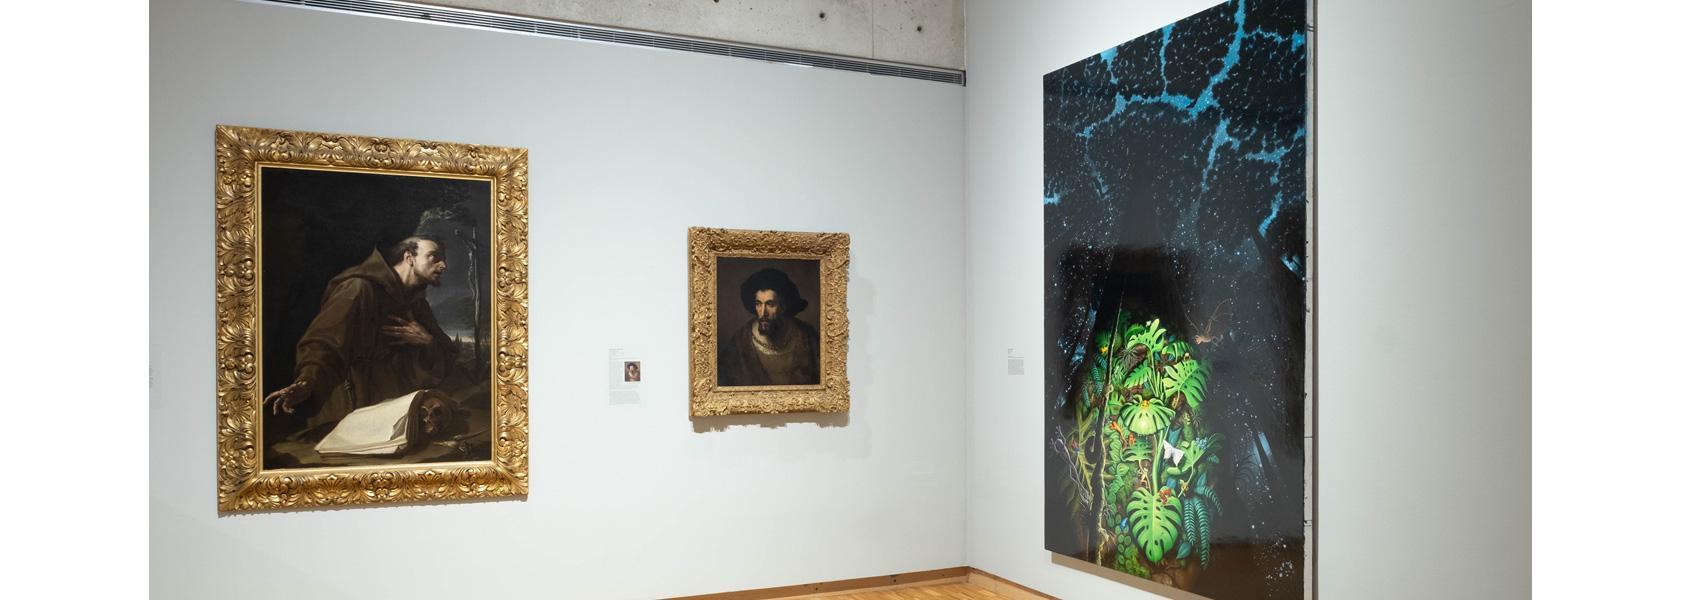 Francesco Trevisani, Rembrant Workshop, and Alexis Rockman